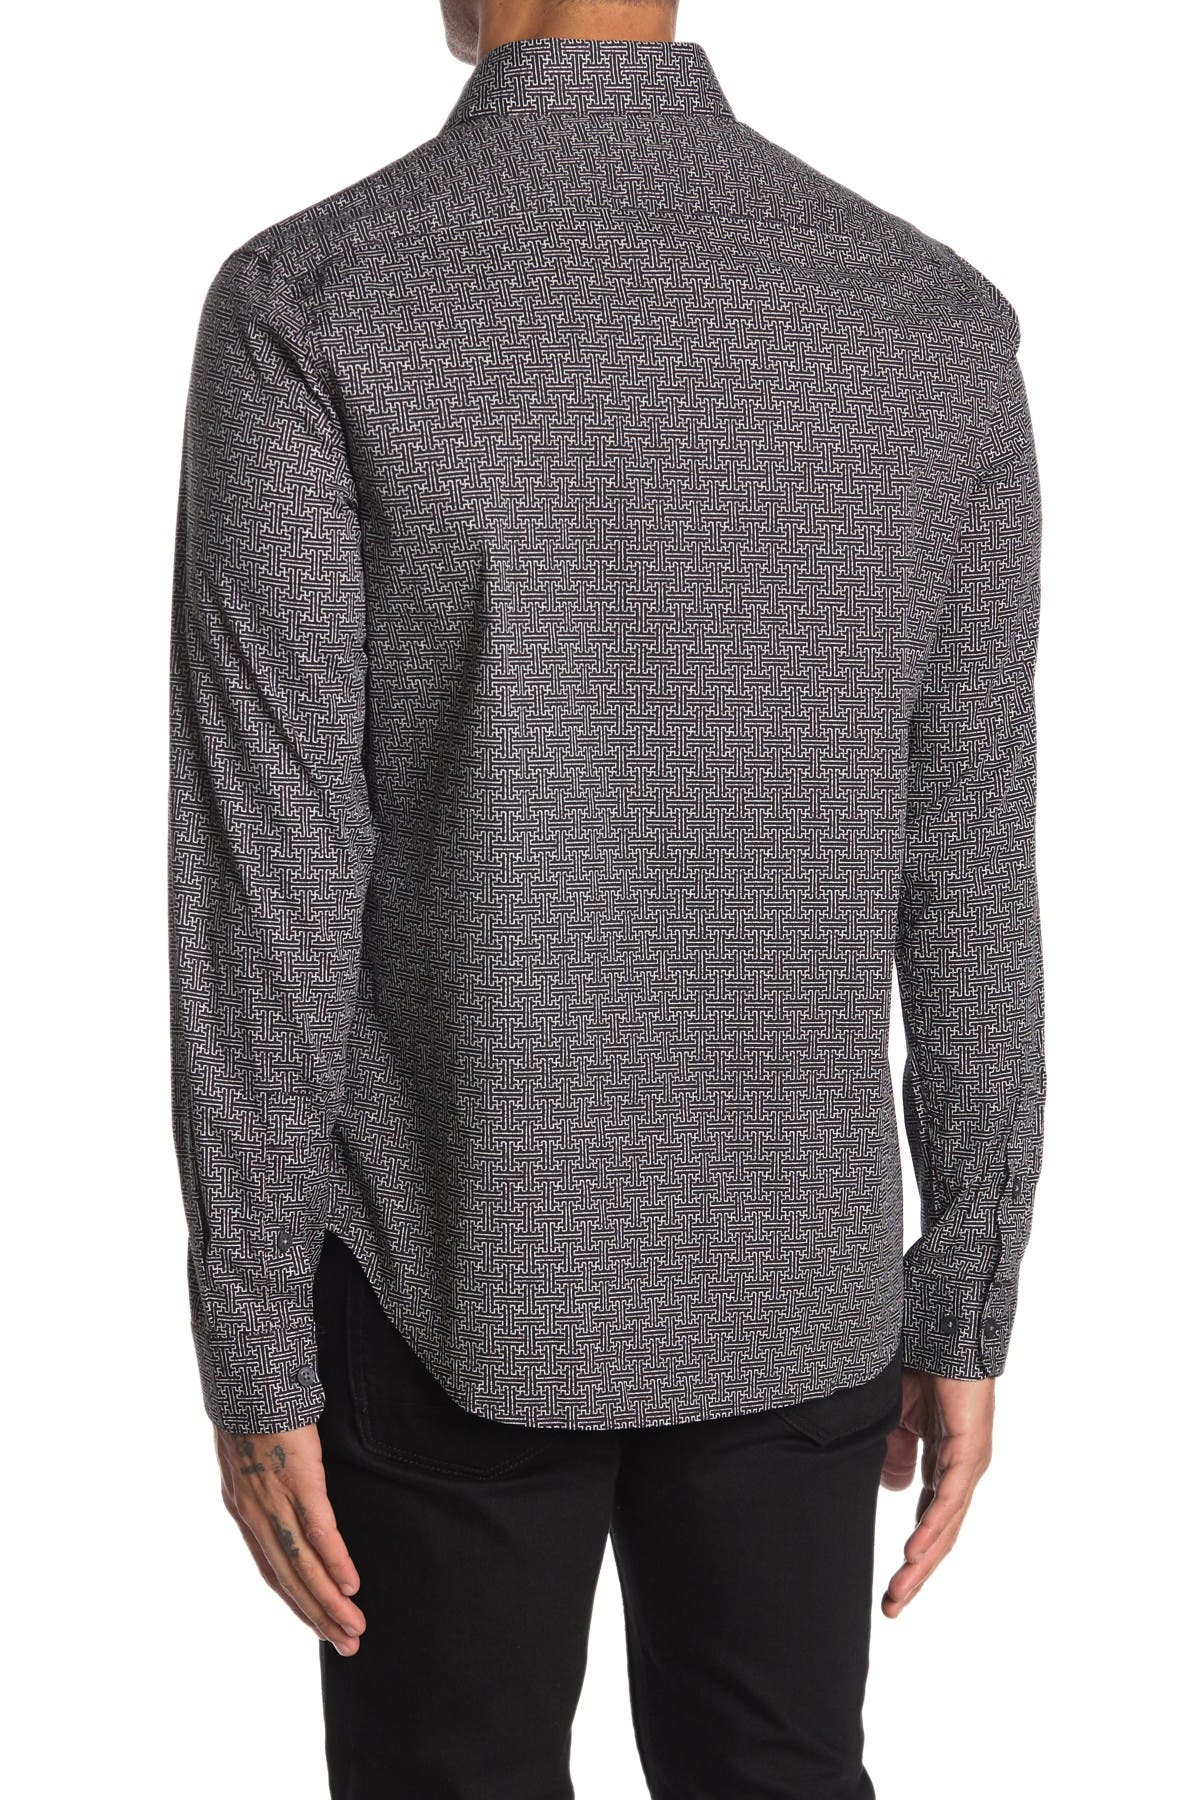 Image of DKNY Maze Print Stretch Dress Shirt